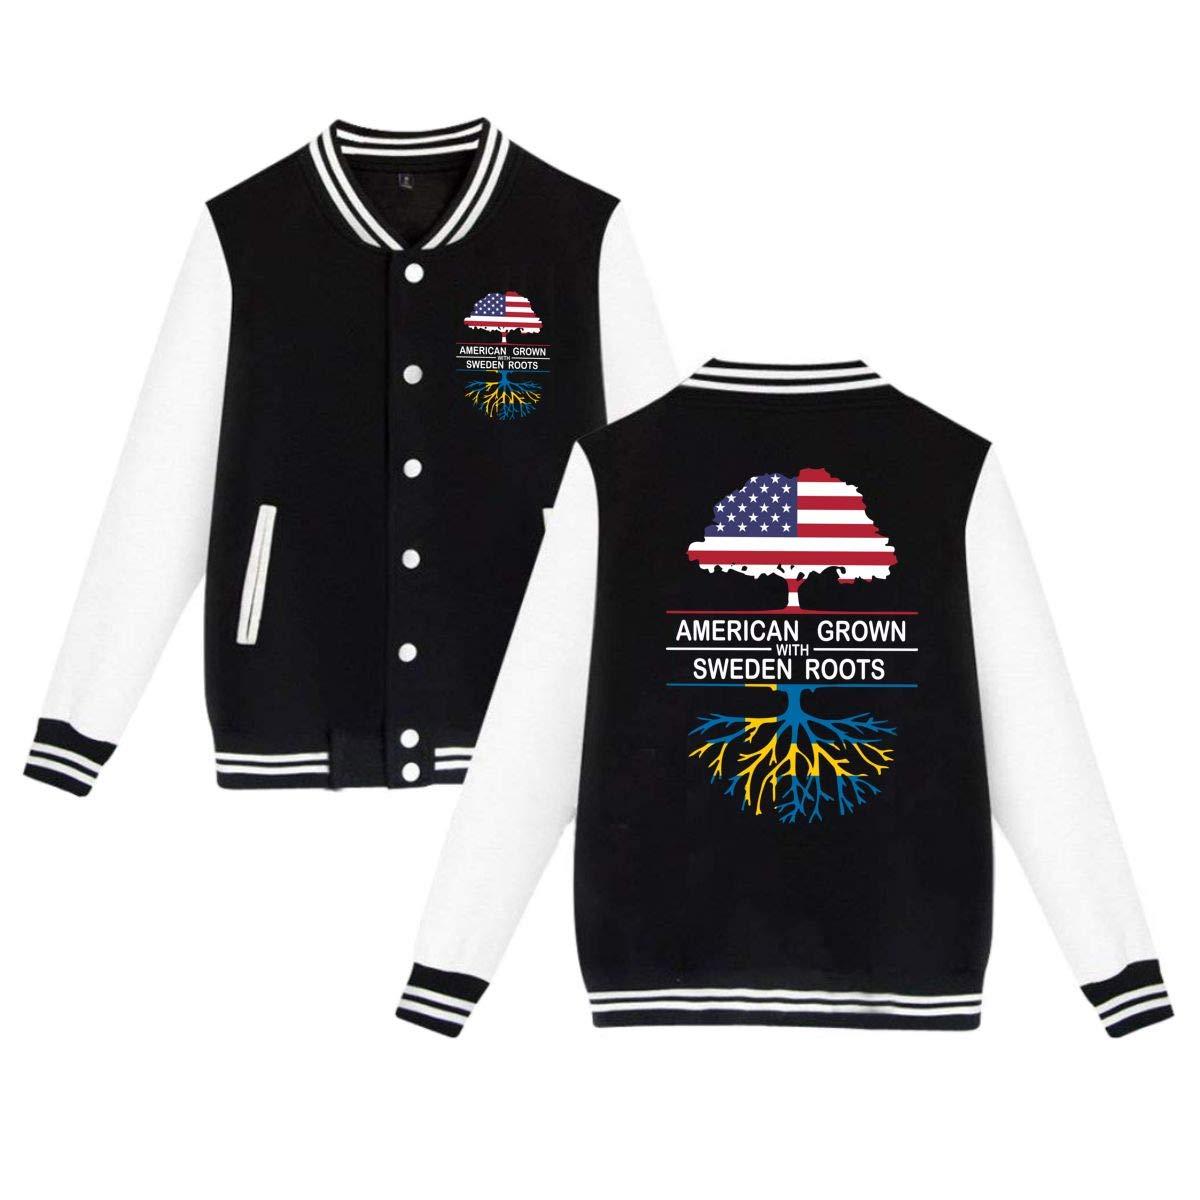 PLS/&A88 Unisex Baseball Jacket Uniform American Grown with Sweden Roots Boys Girls Hoodie Sweatshirt Sweater Coat